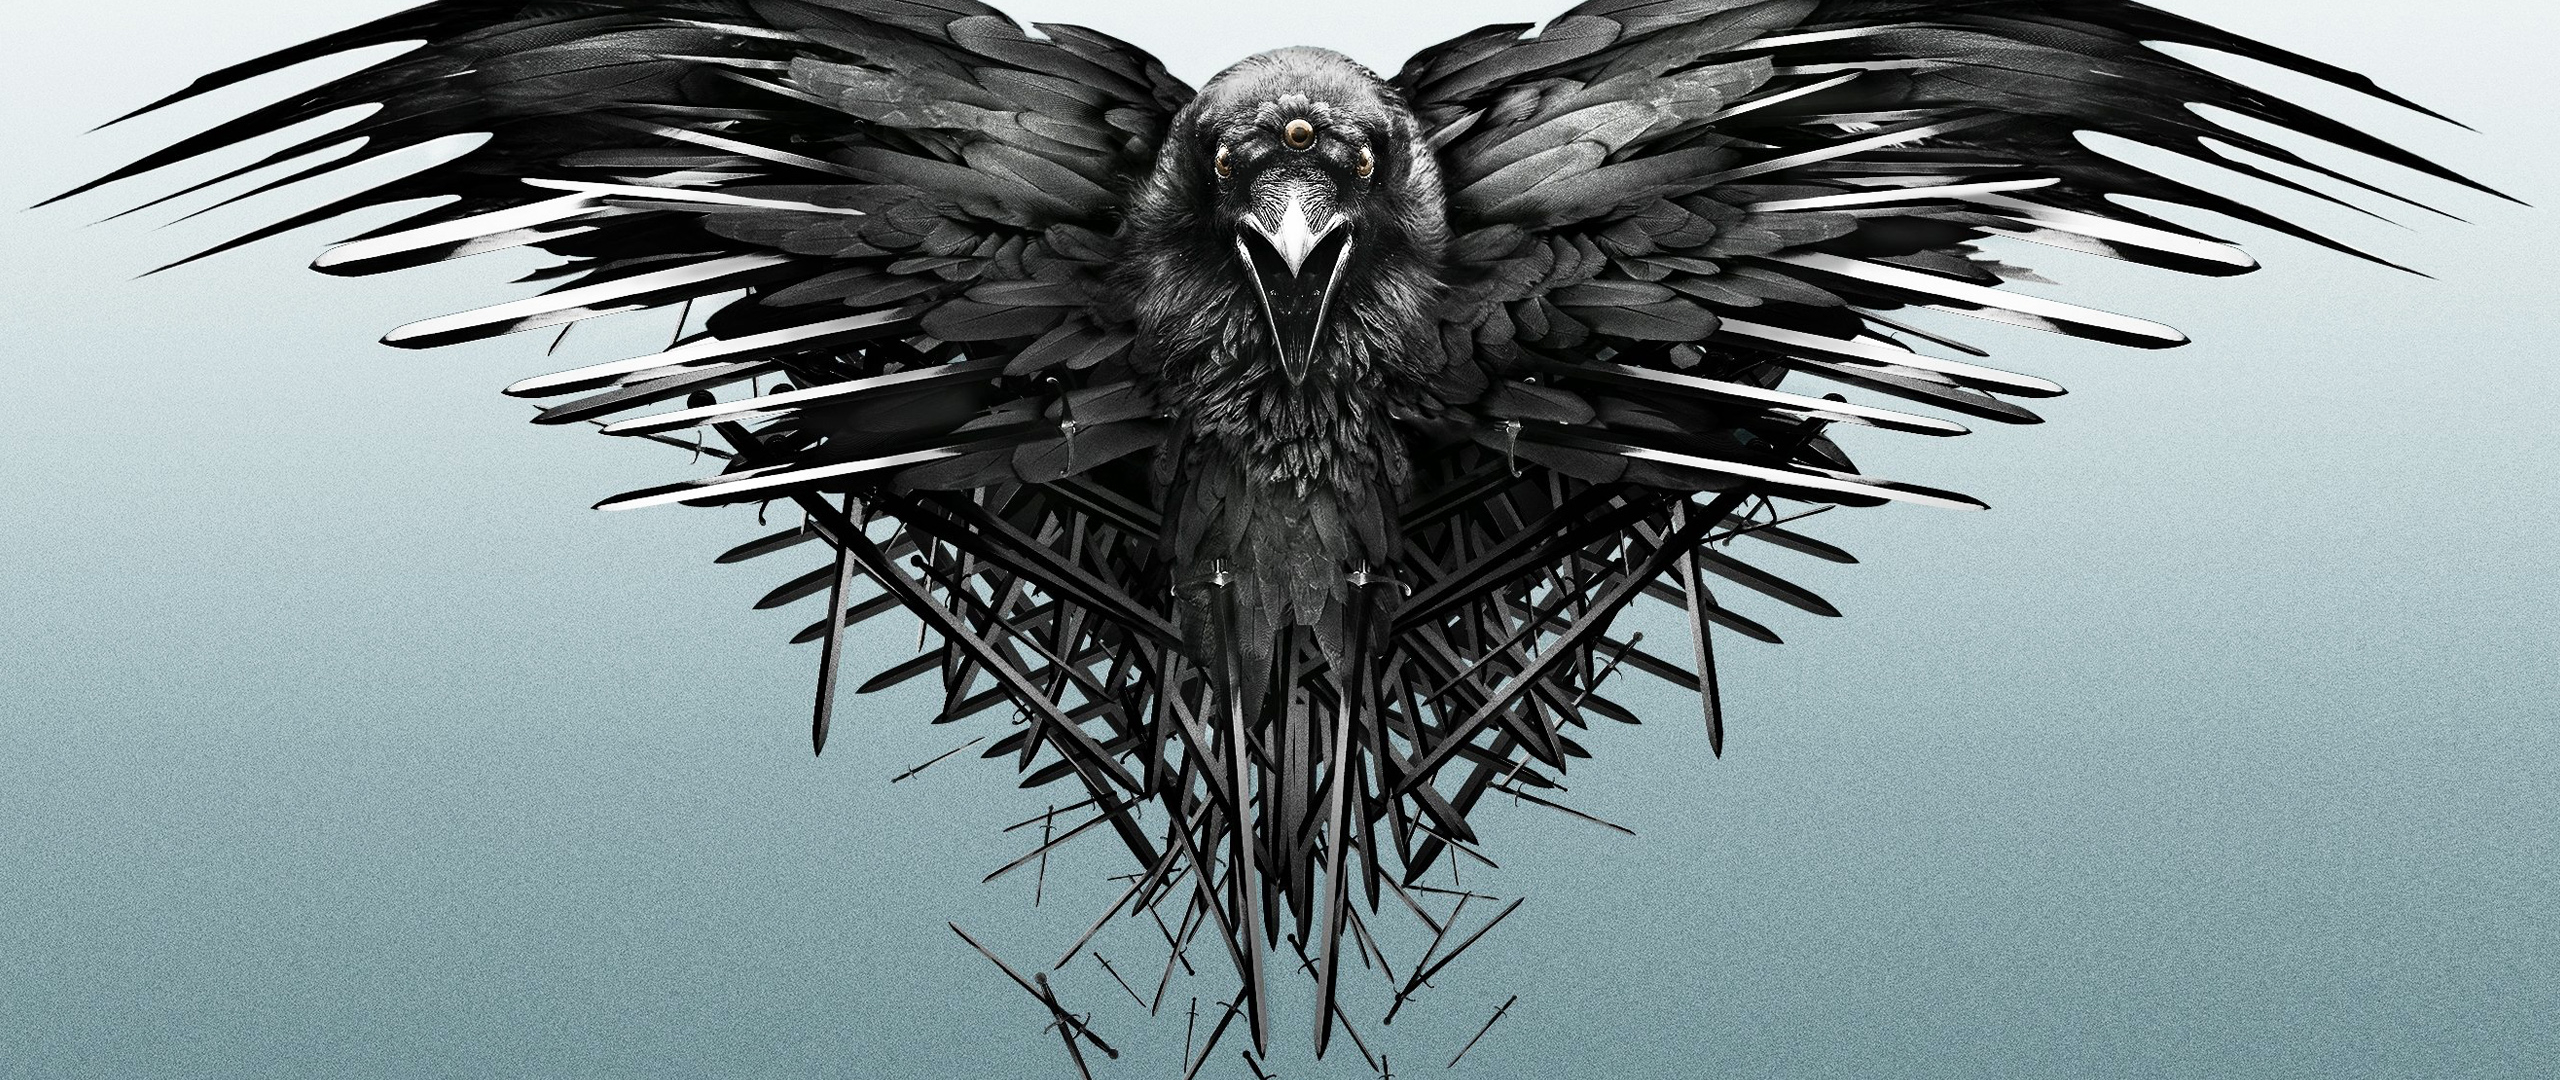 Game of thrones season 4 photoshoot full hd 2k wallpaper wide voltagebd Images